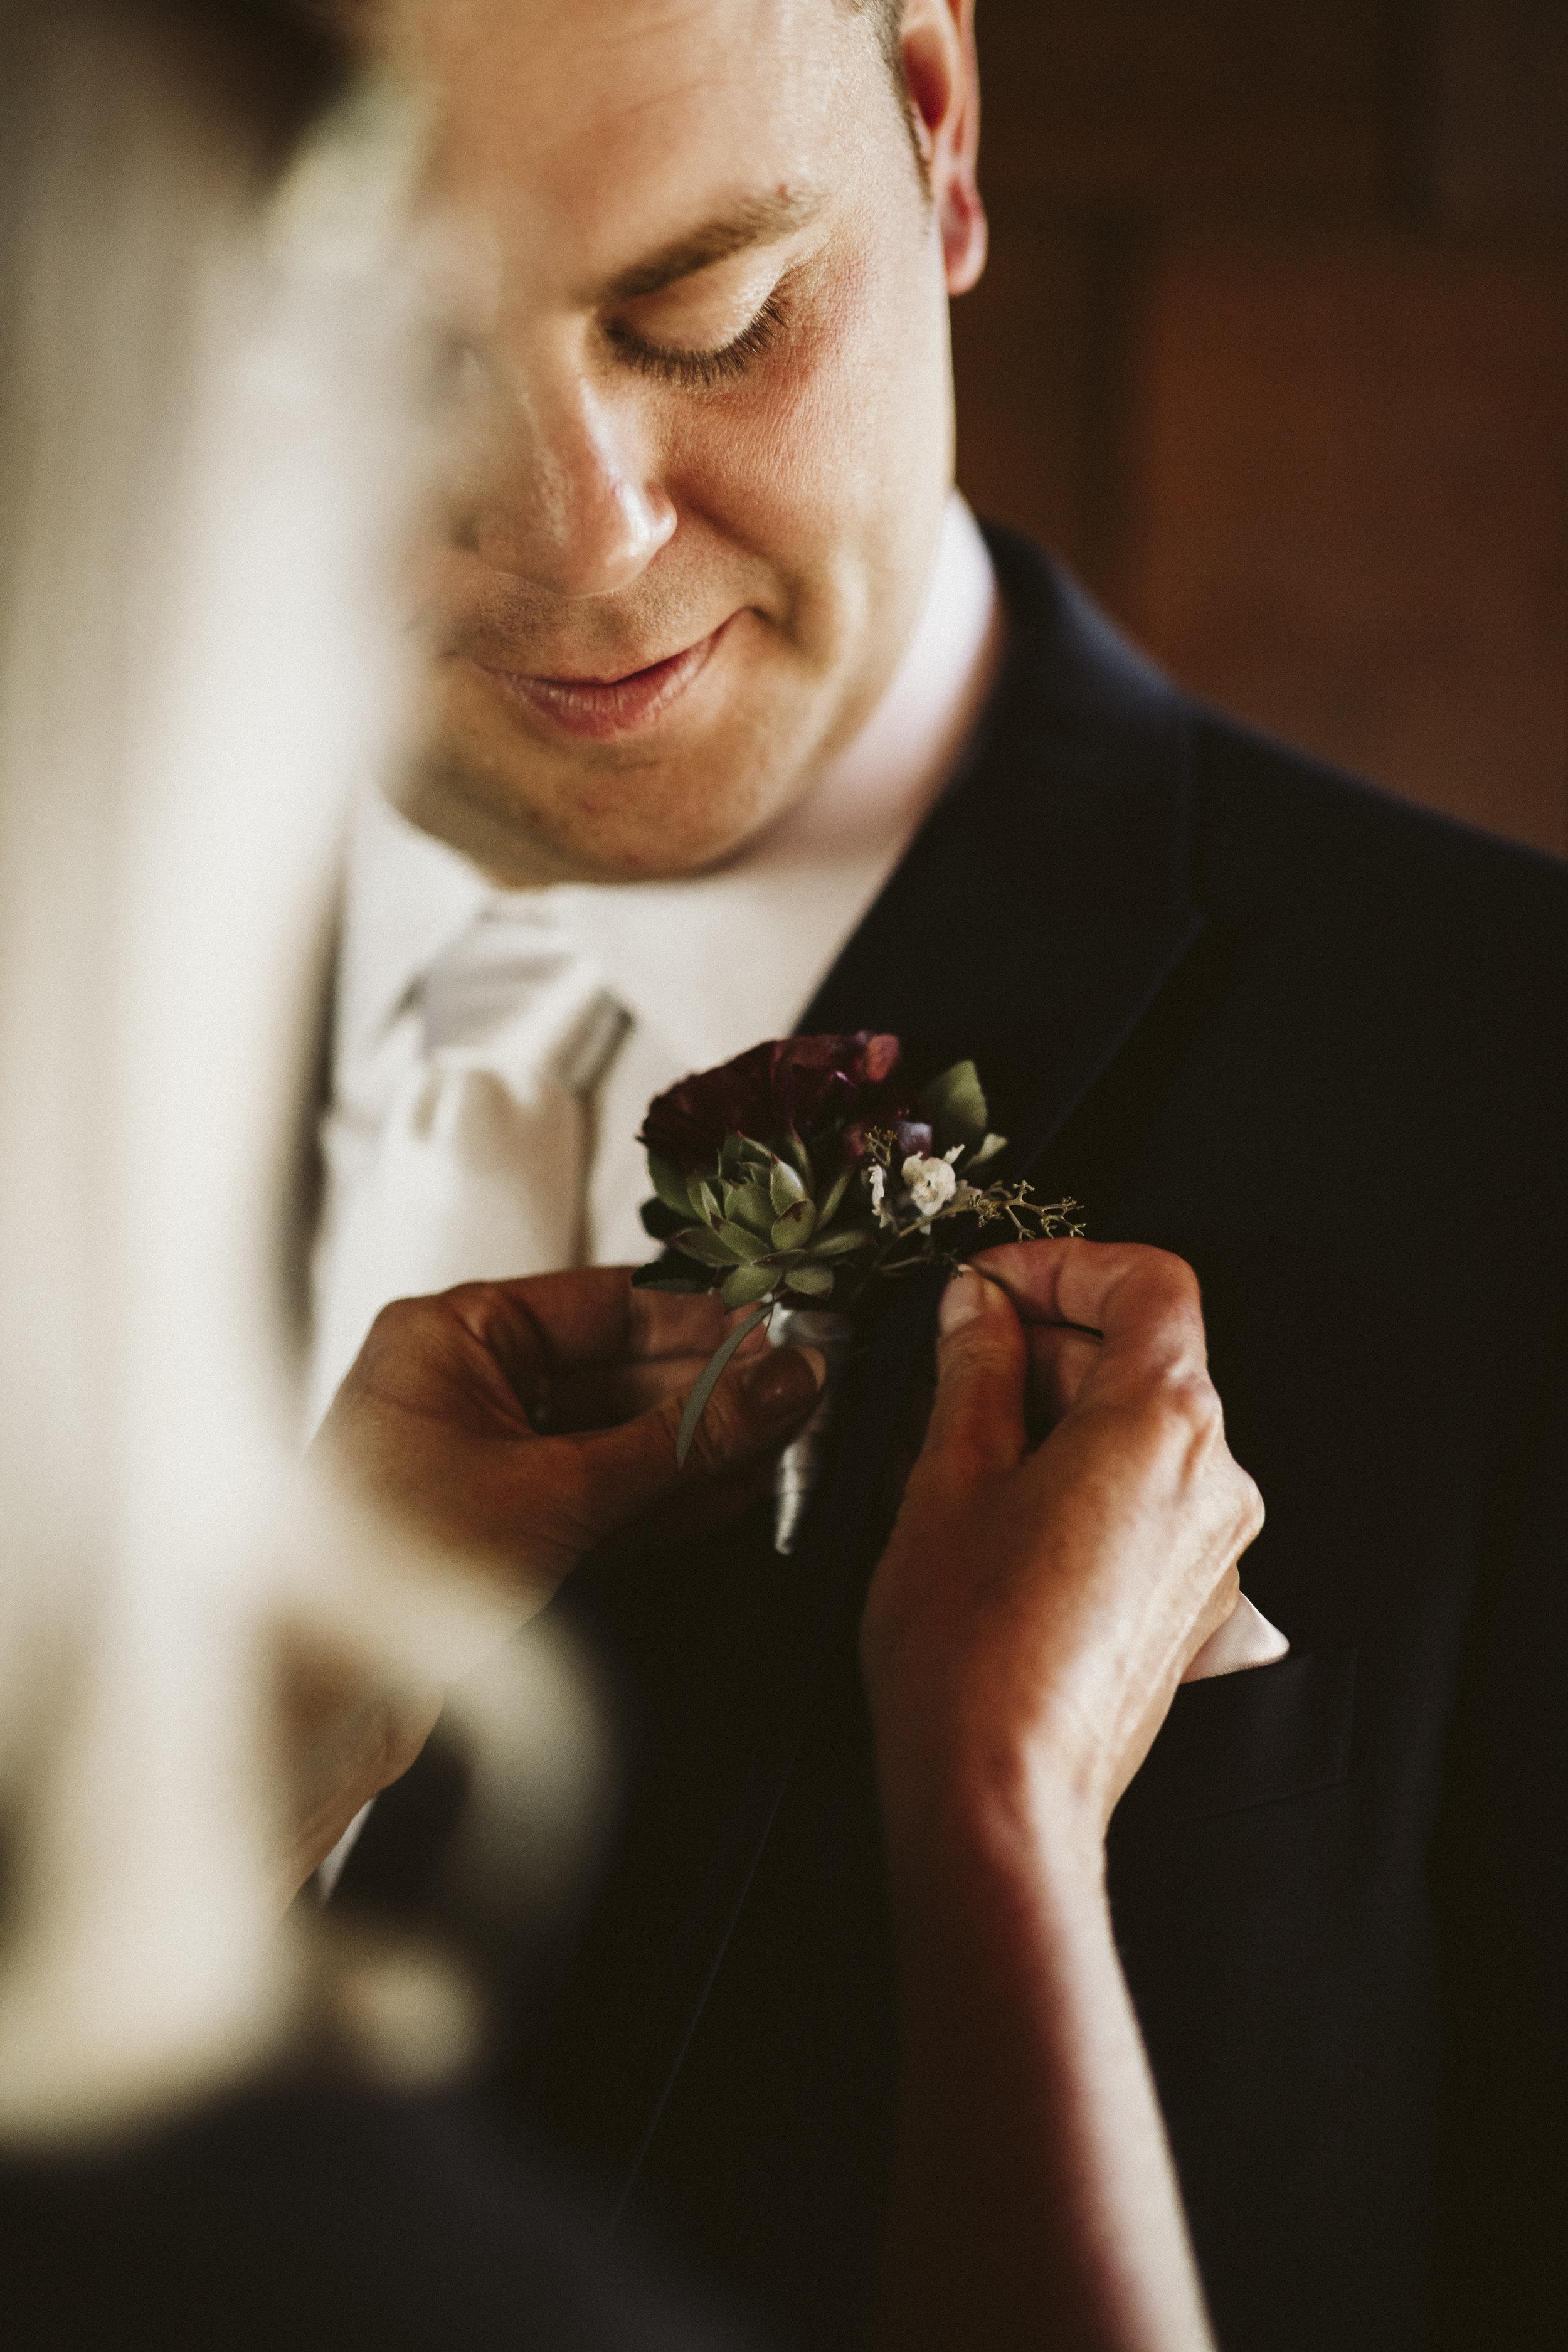 _P8A3286vildphotography-photography-wedding-weddingphotography-tahoewedding-tahoeweddingphotographer-adventurewedding-jake-amy.jpg